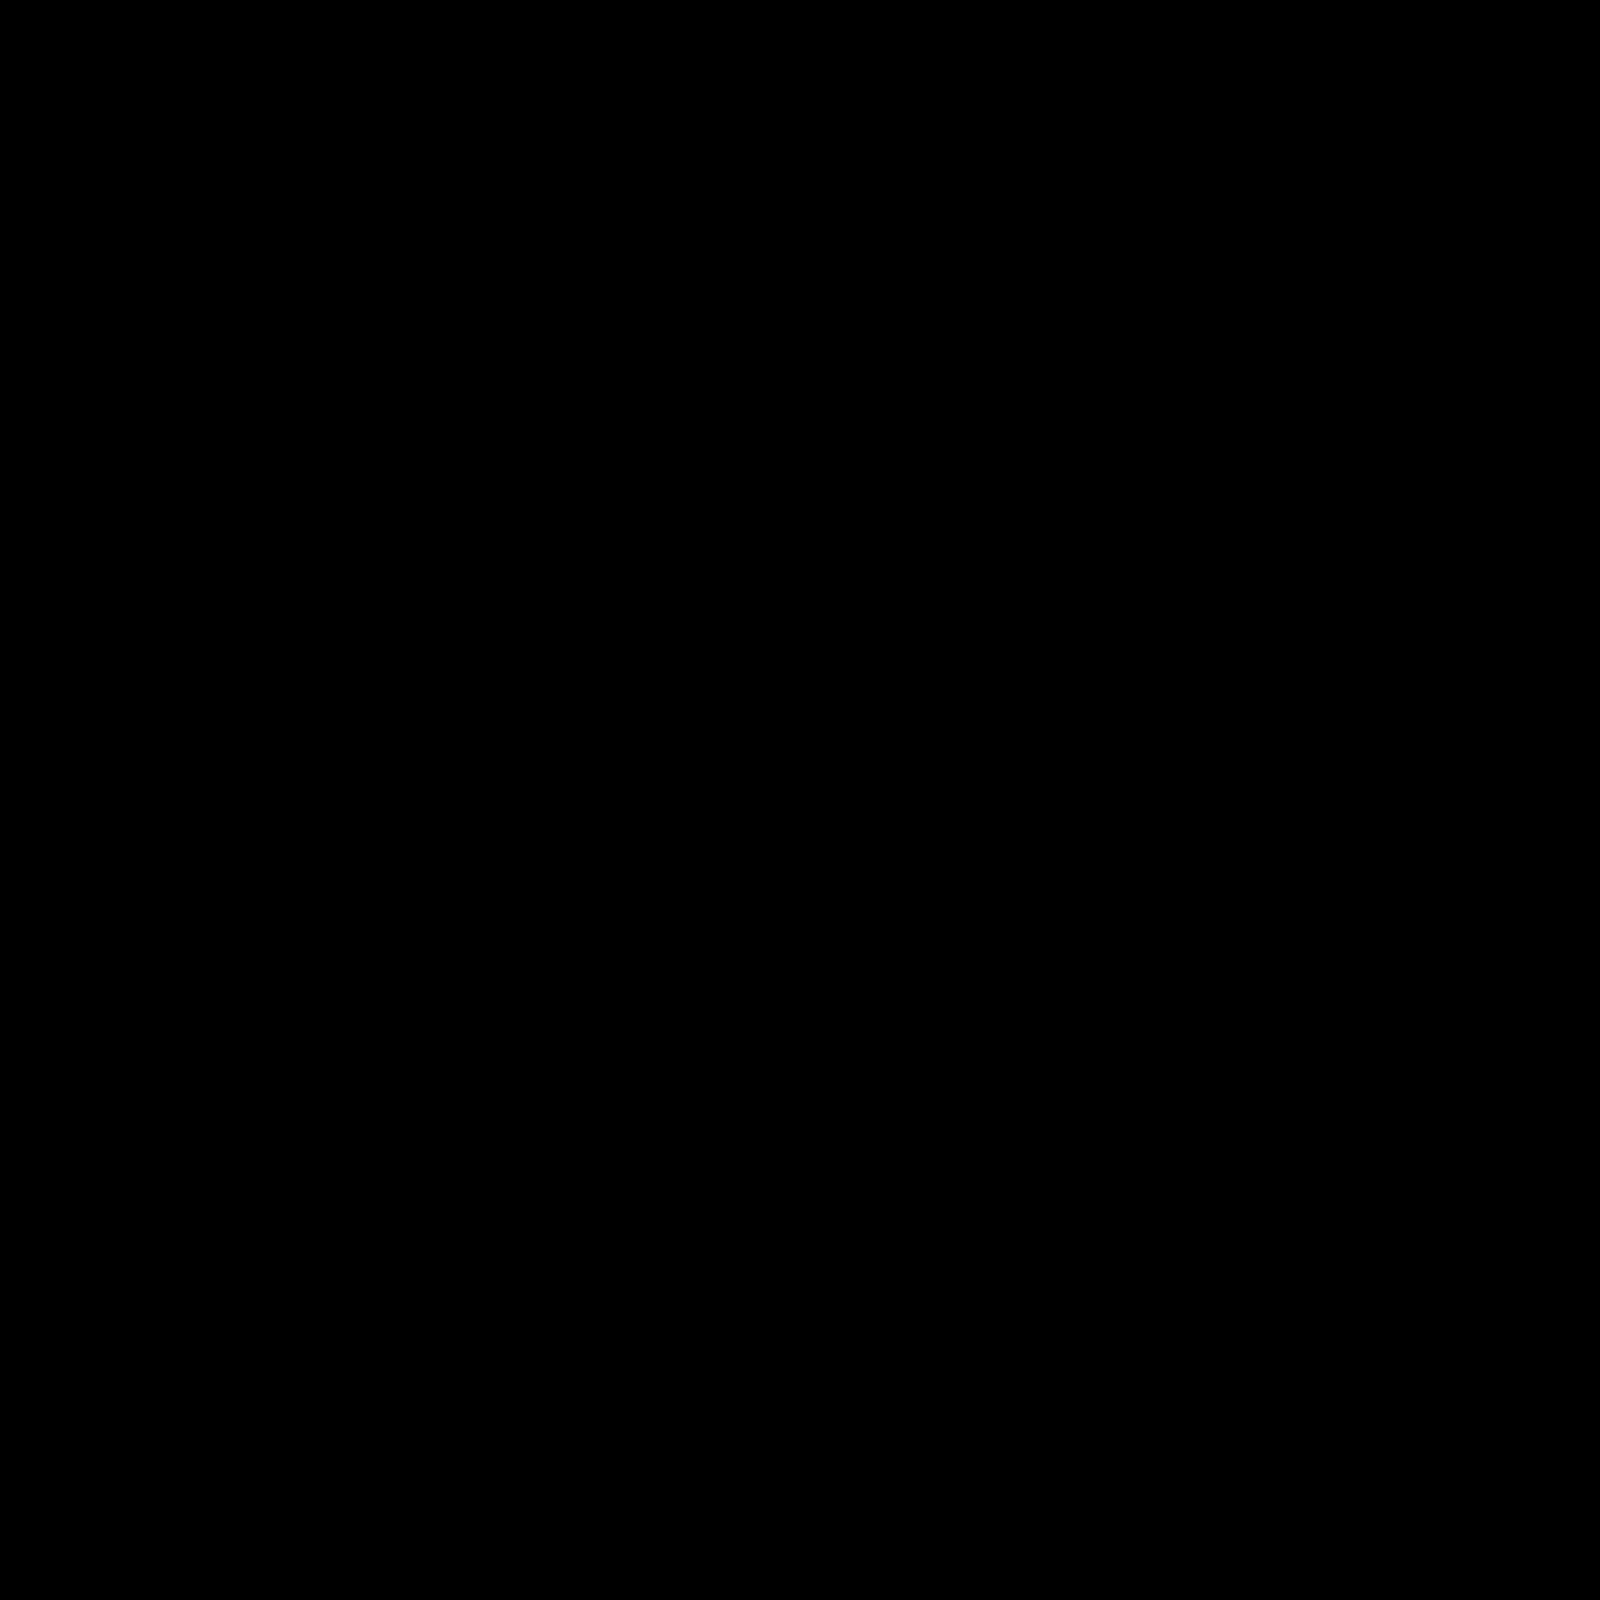 Move Node Up icon